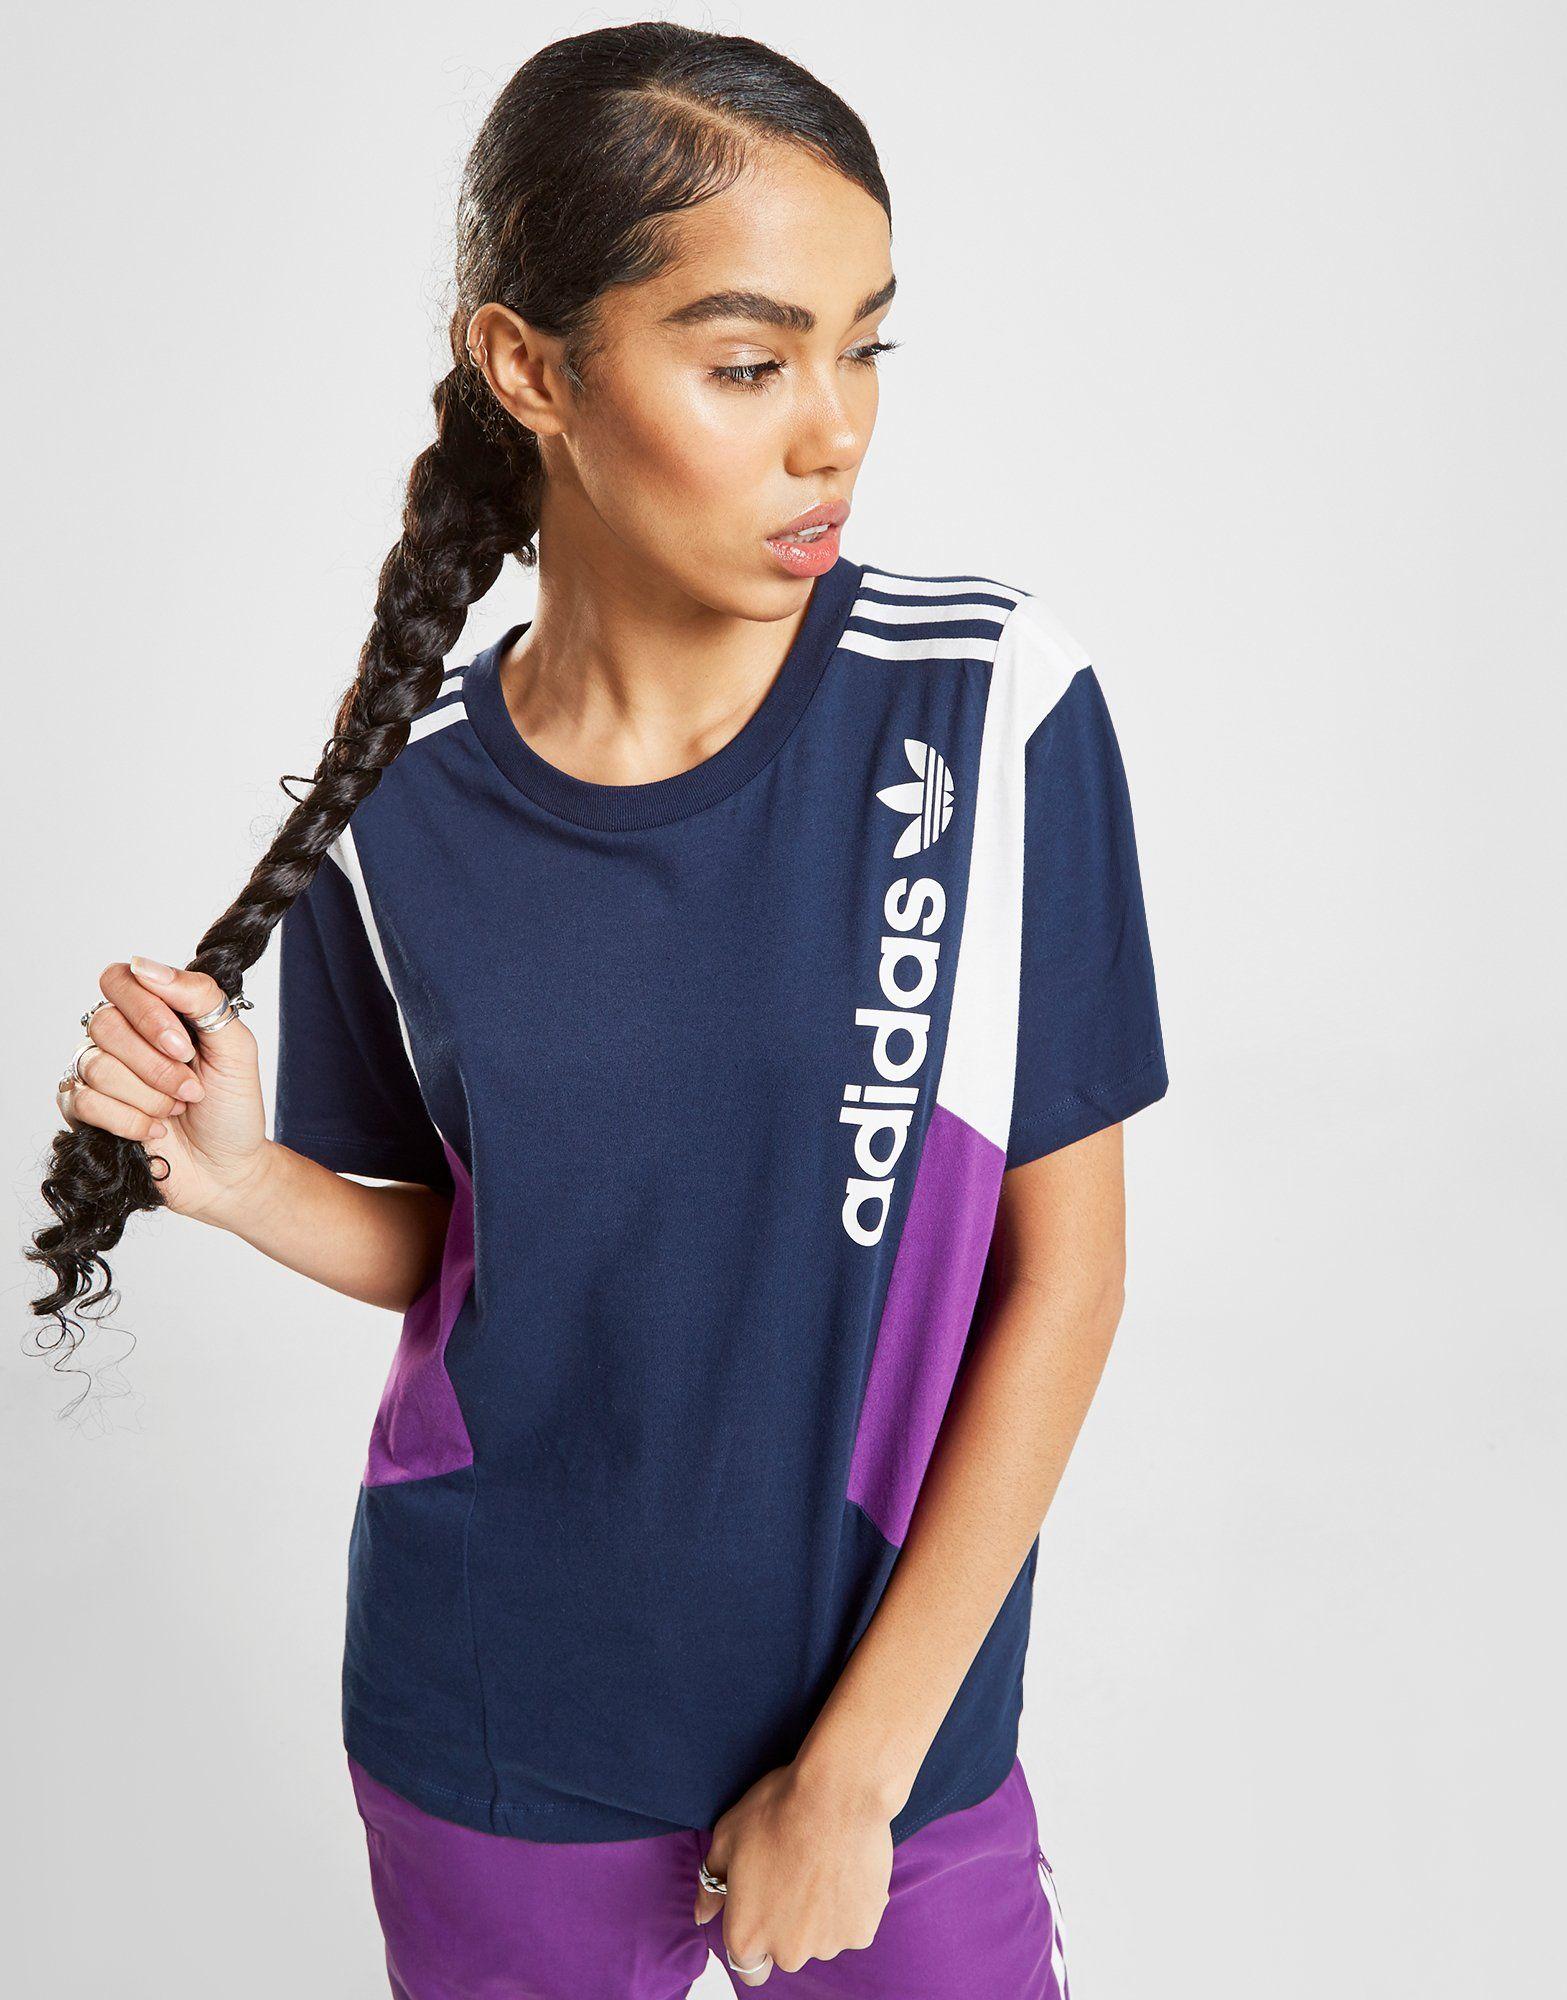 72b6665a9335 adidas Originals 90 s Colour Block Boyfriend T-Shirt